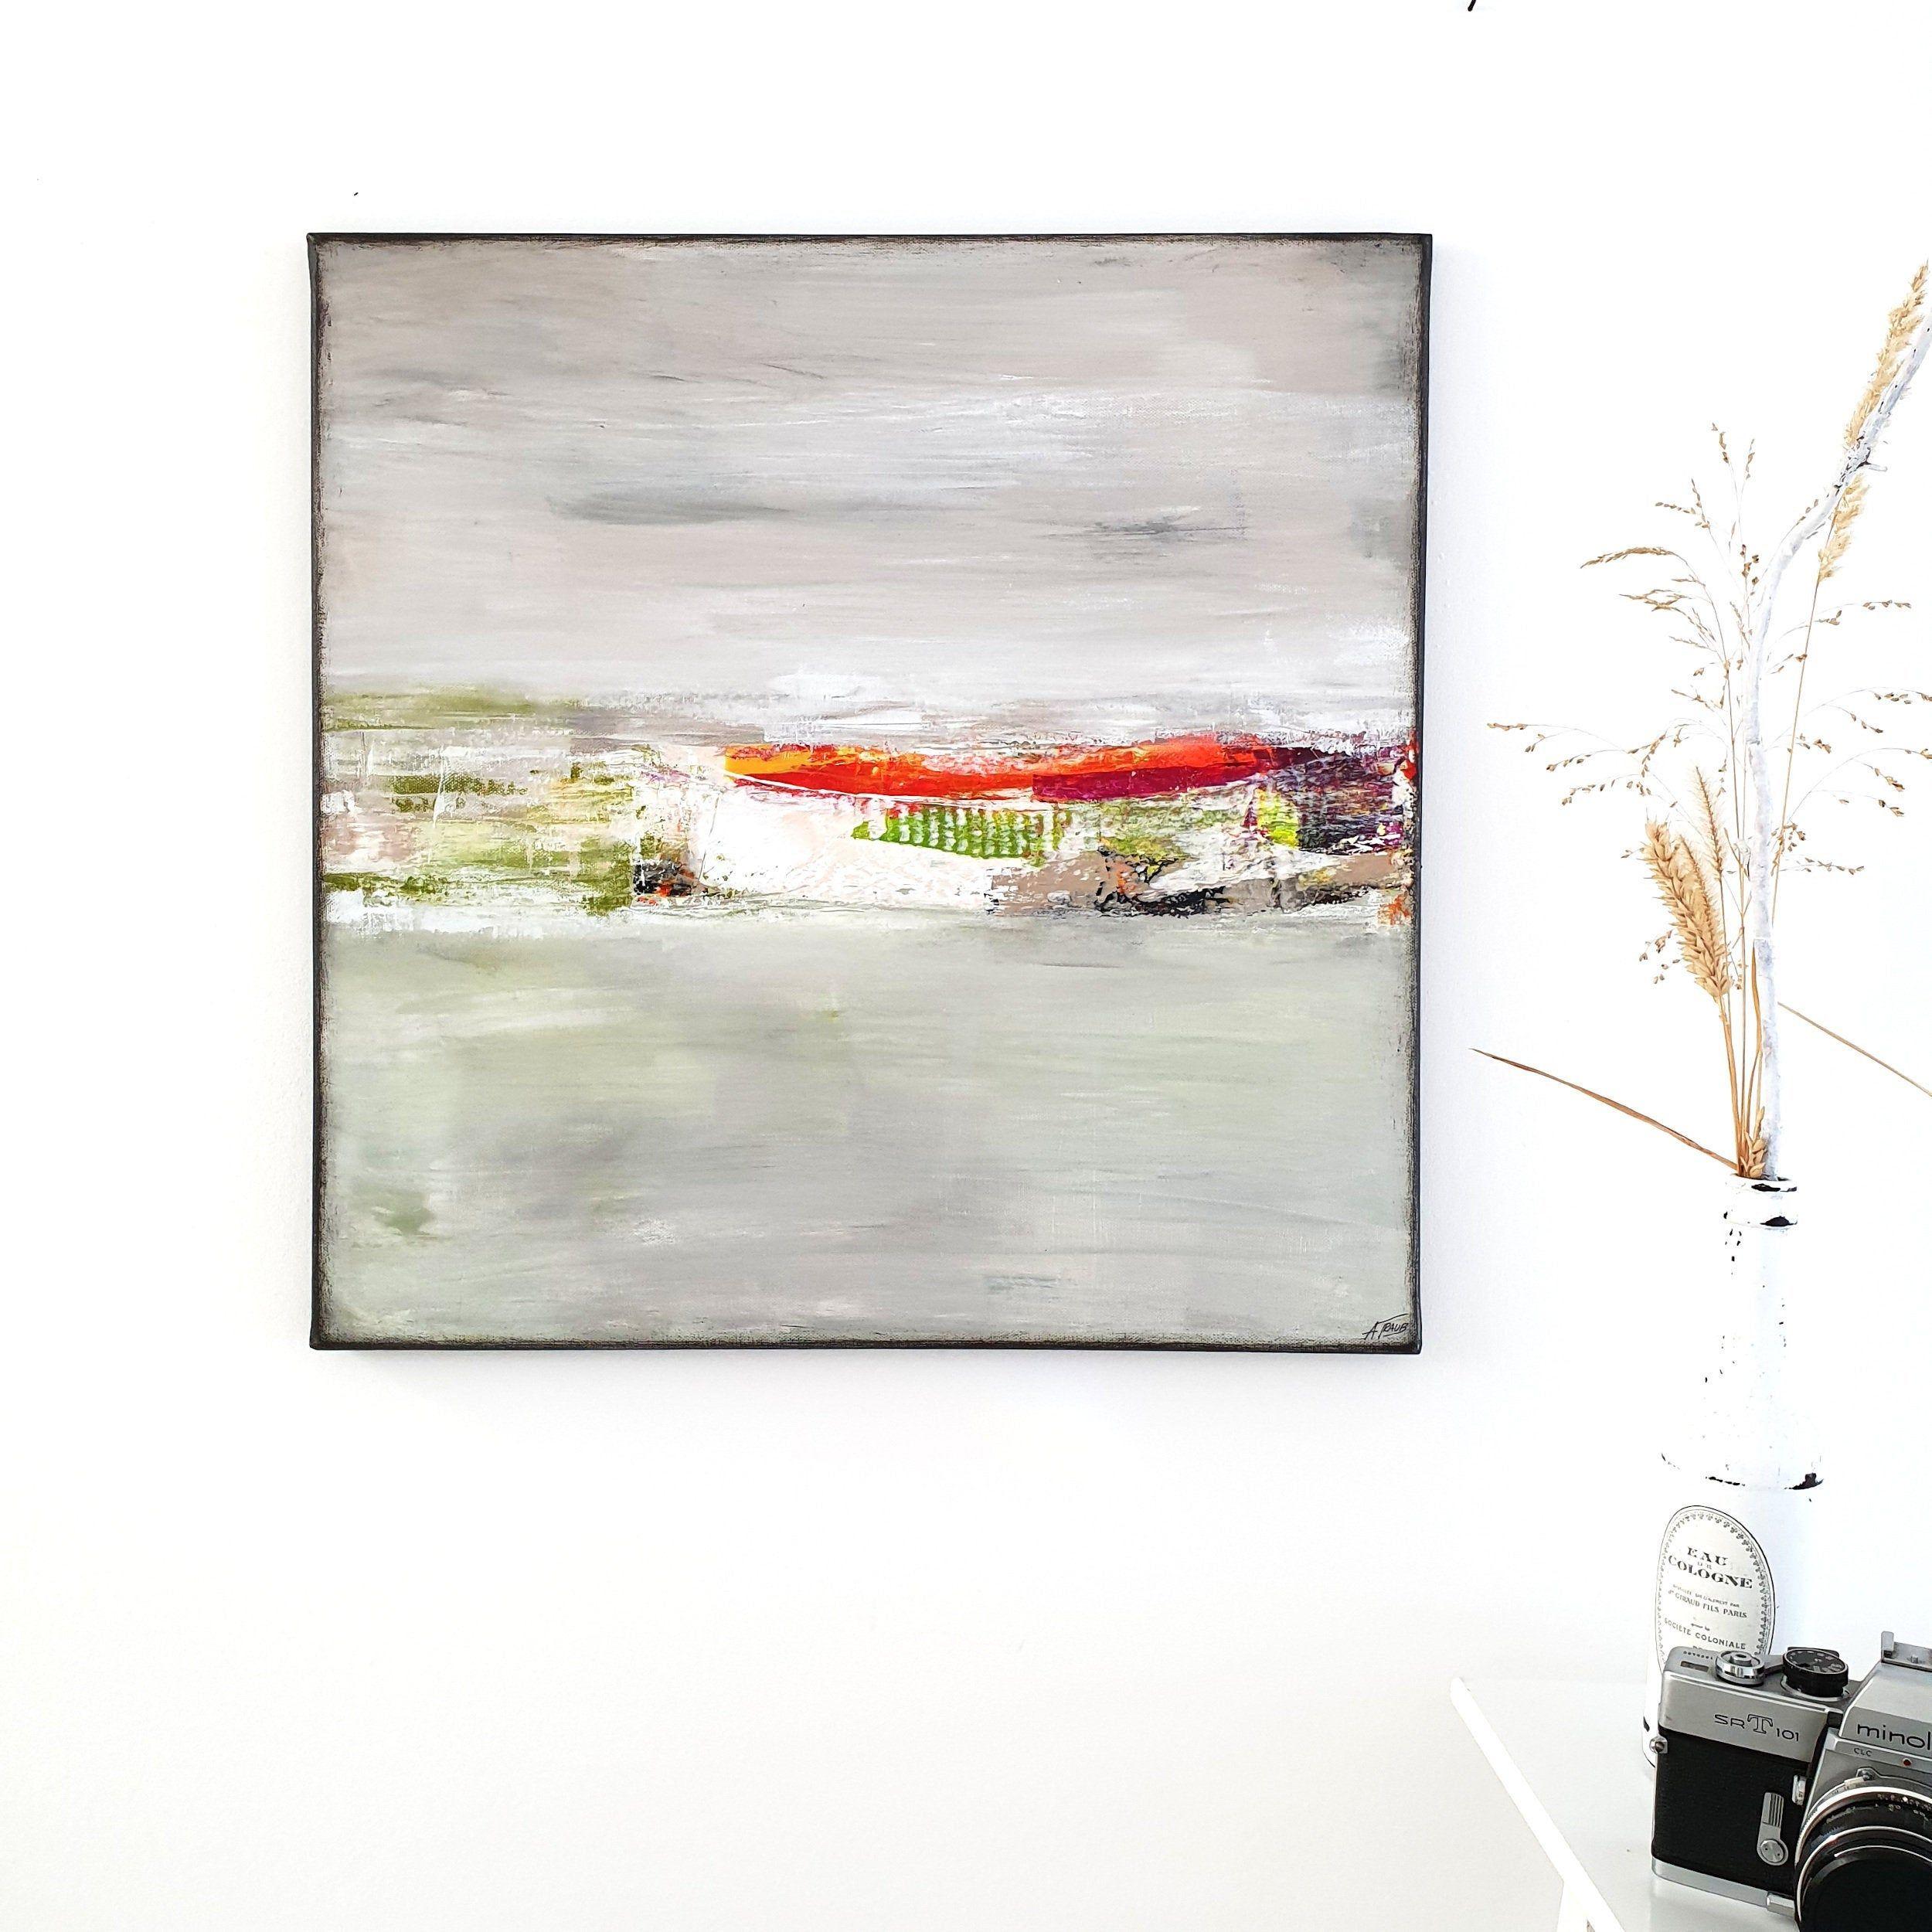 A Traub Malerei 50x50 Cm Acryl Auf Leinwand Kunst Modern Abstrakt Gemalt Wandbild Acrylbilder Acrylmalerei Original Bi In 2020 Abstrakt Malen Acrylmalerei Malerei